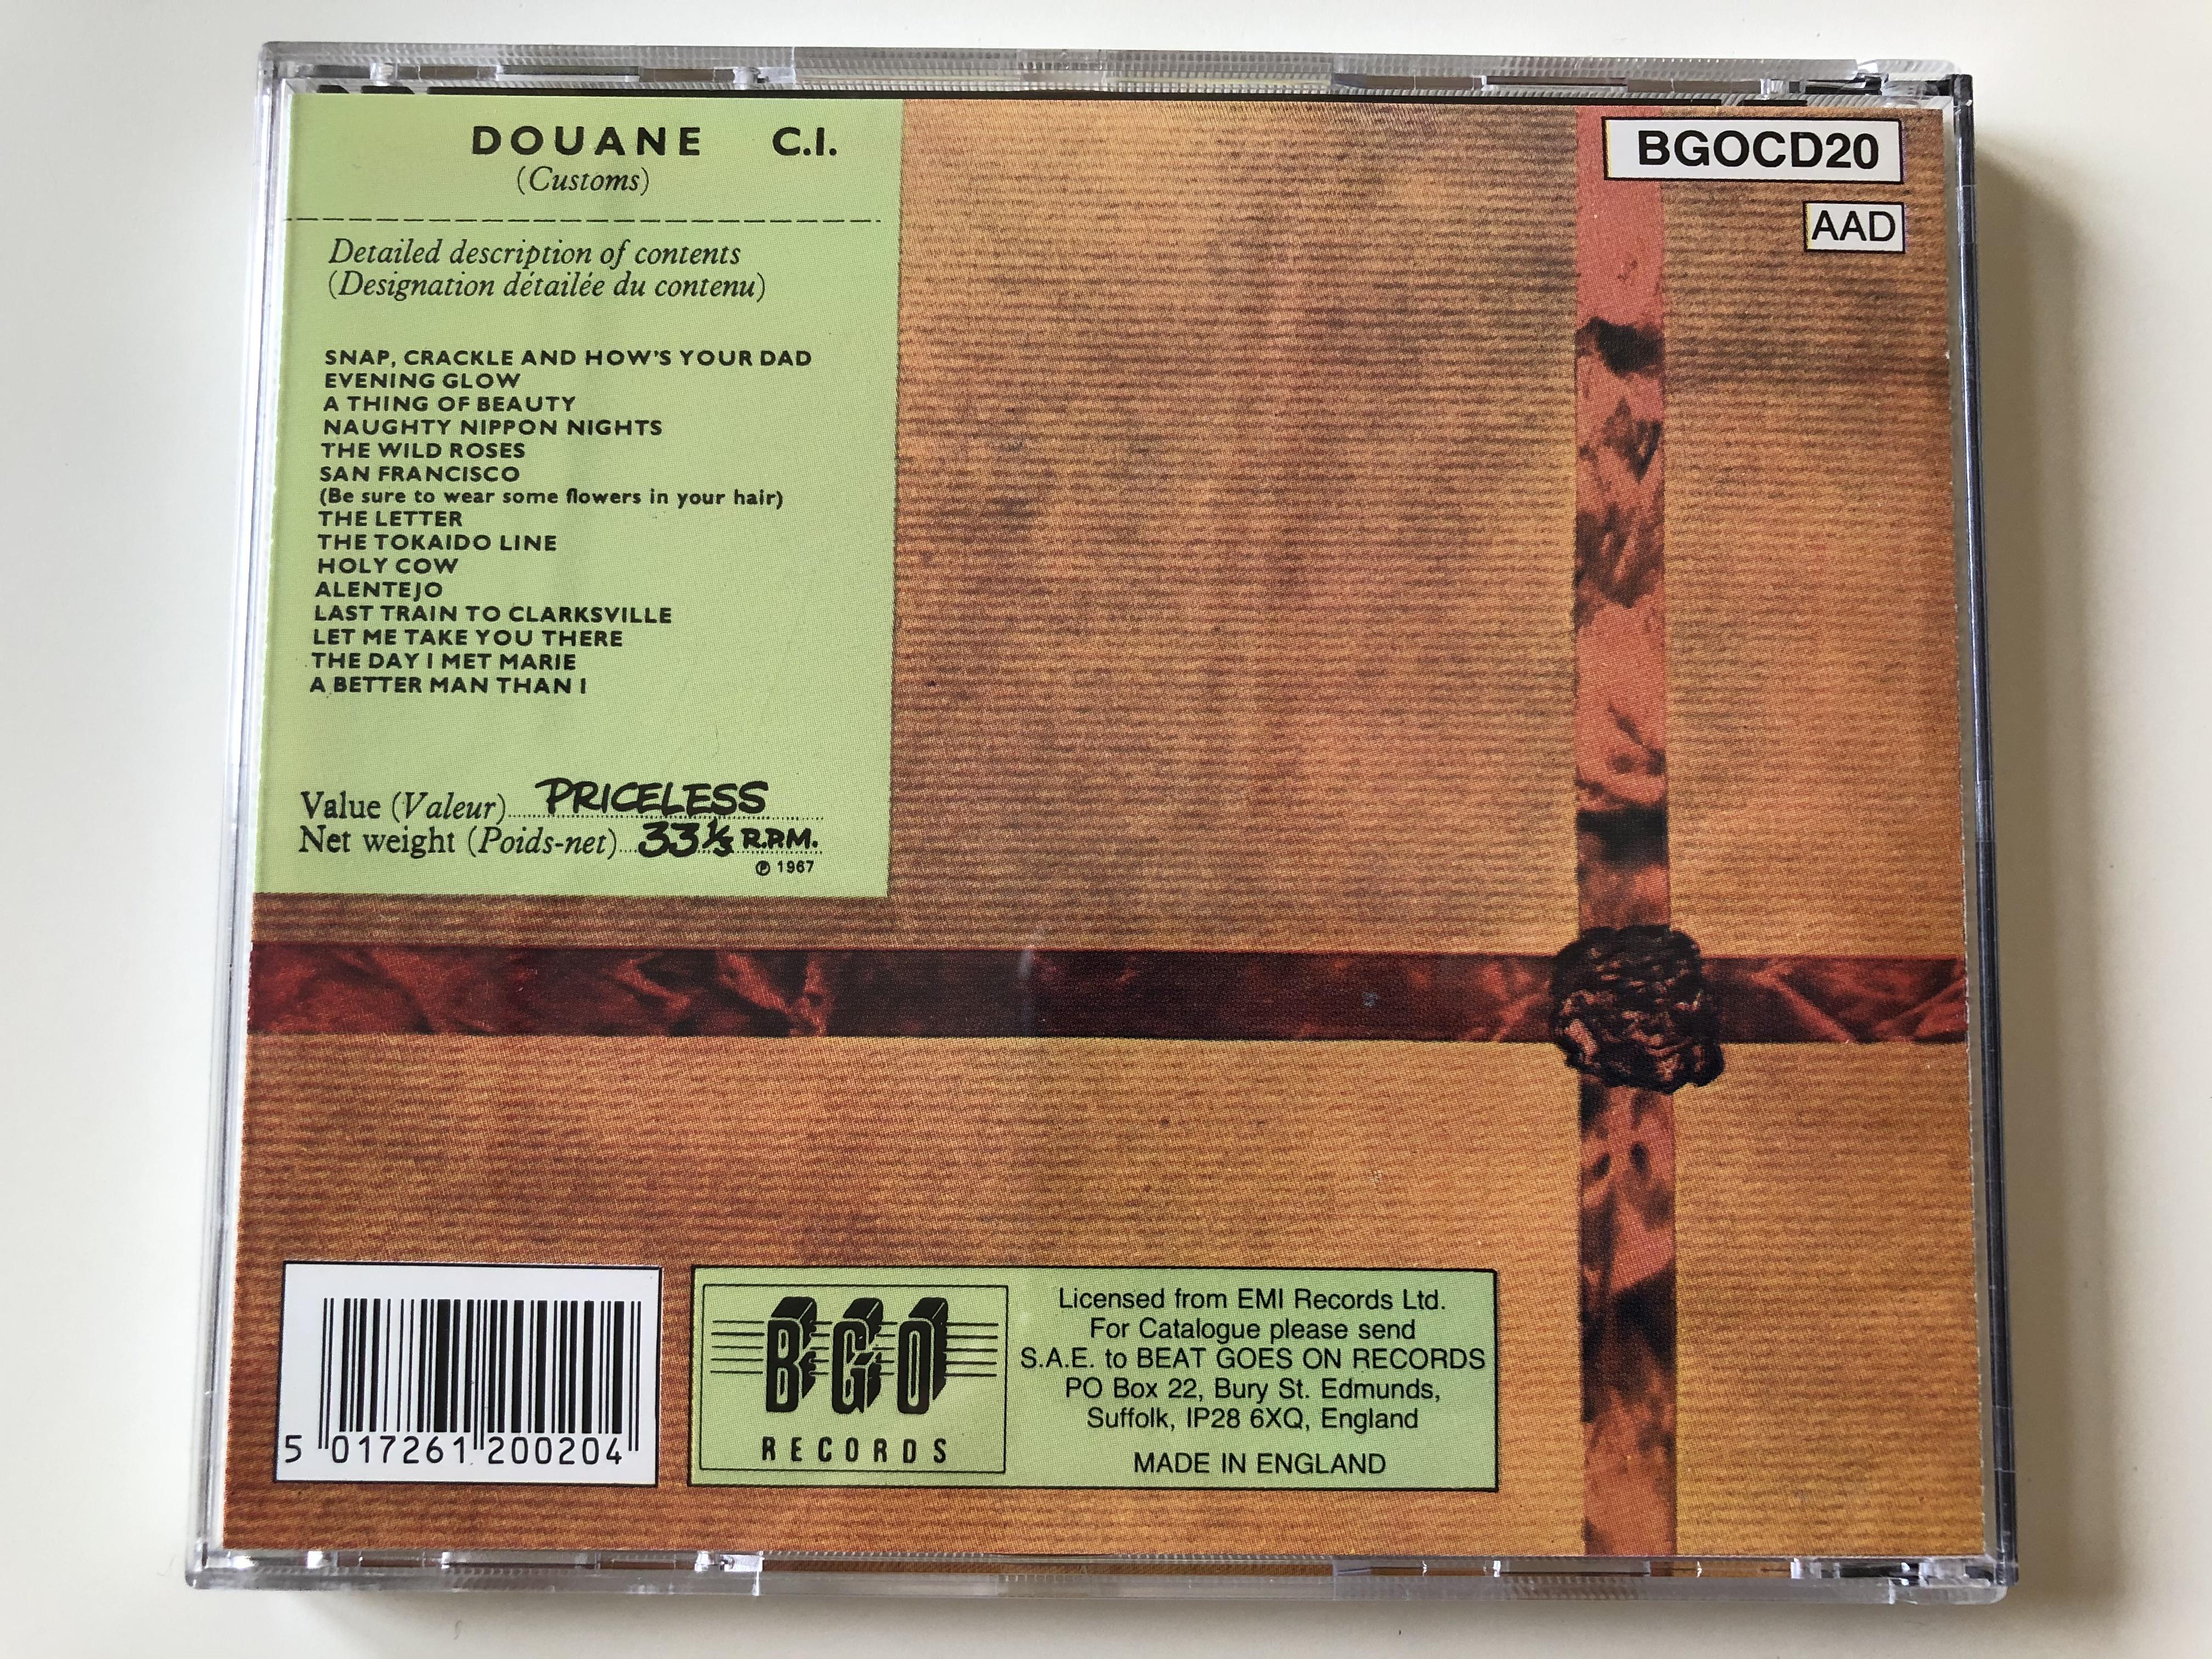 the-shadows-from-hank-brian-bruce-john-bgo-records-audio-cd-1990-bgocd20-5-.jpg